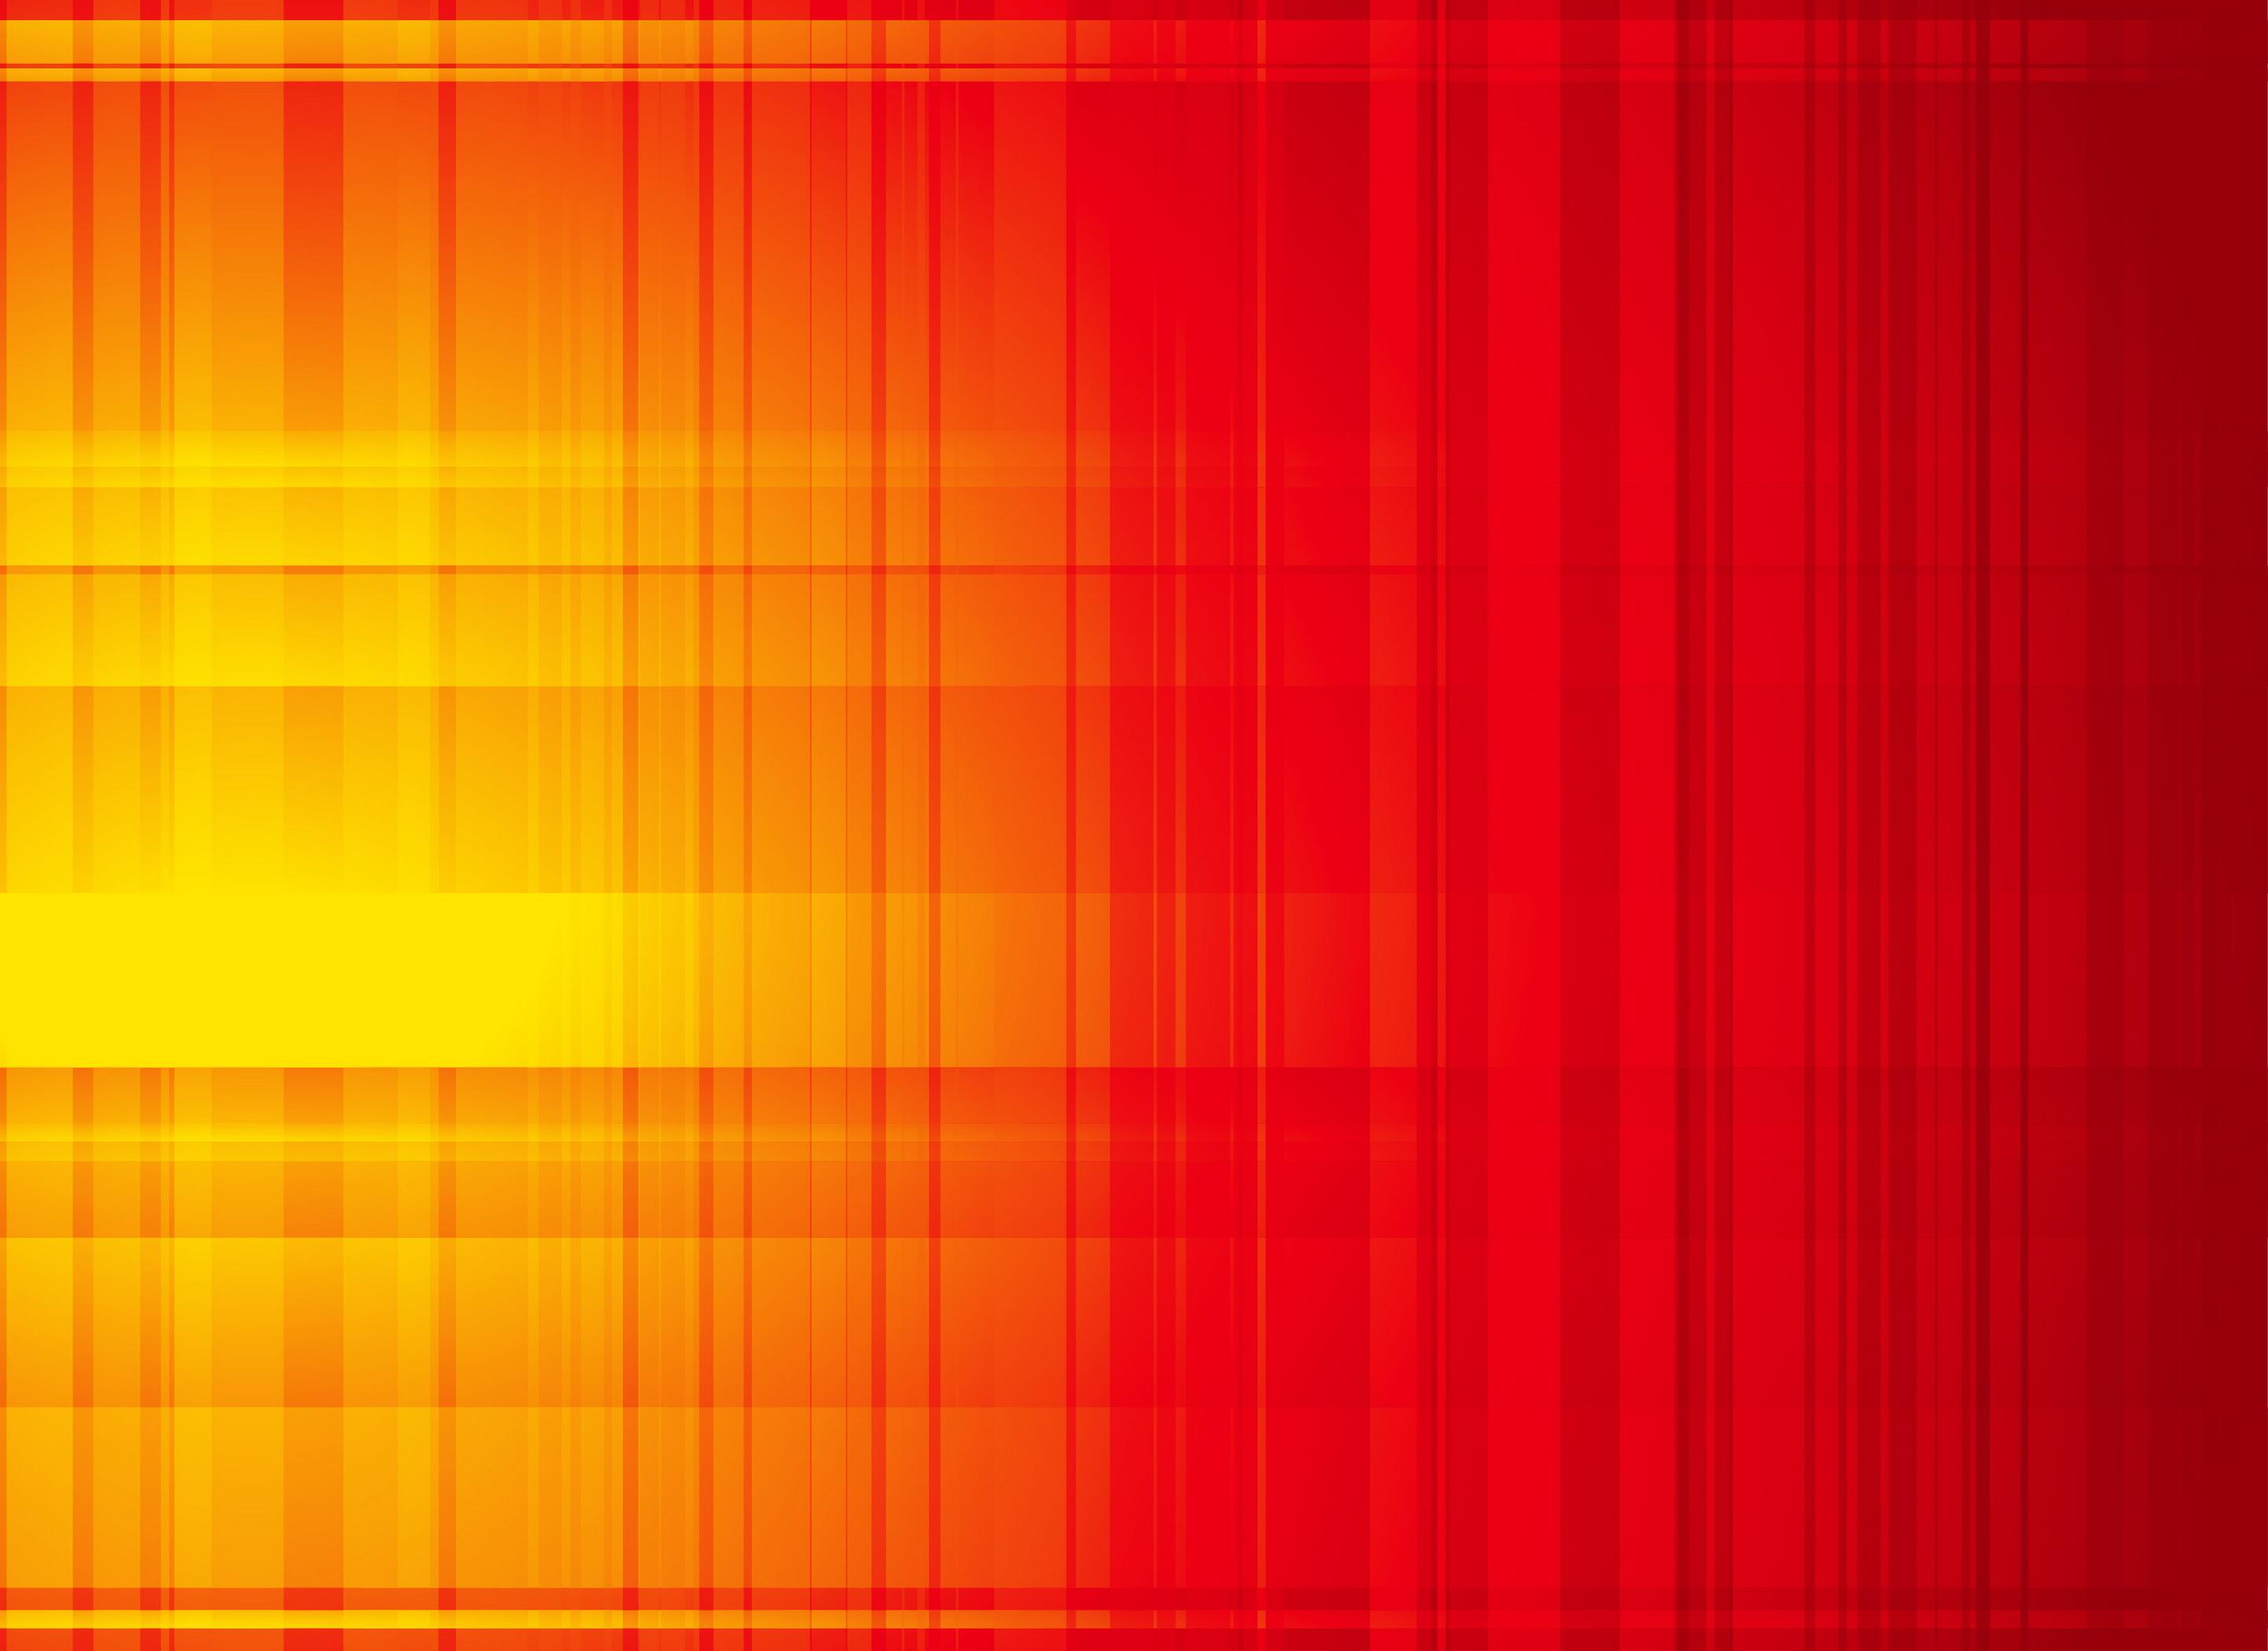 rayas rojas rojo stripe lineal imagen de fondo para